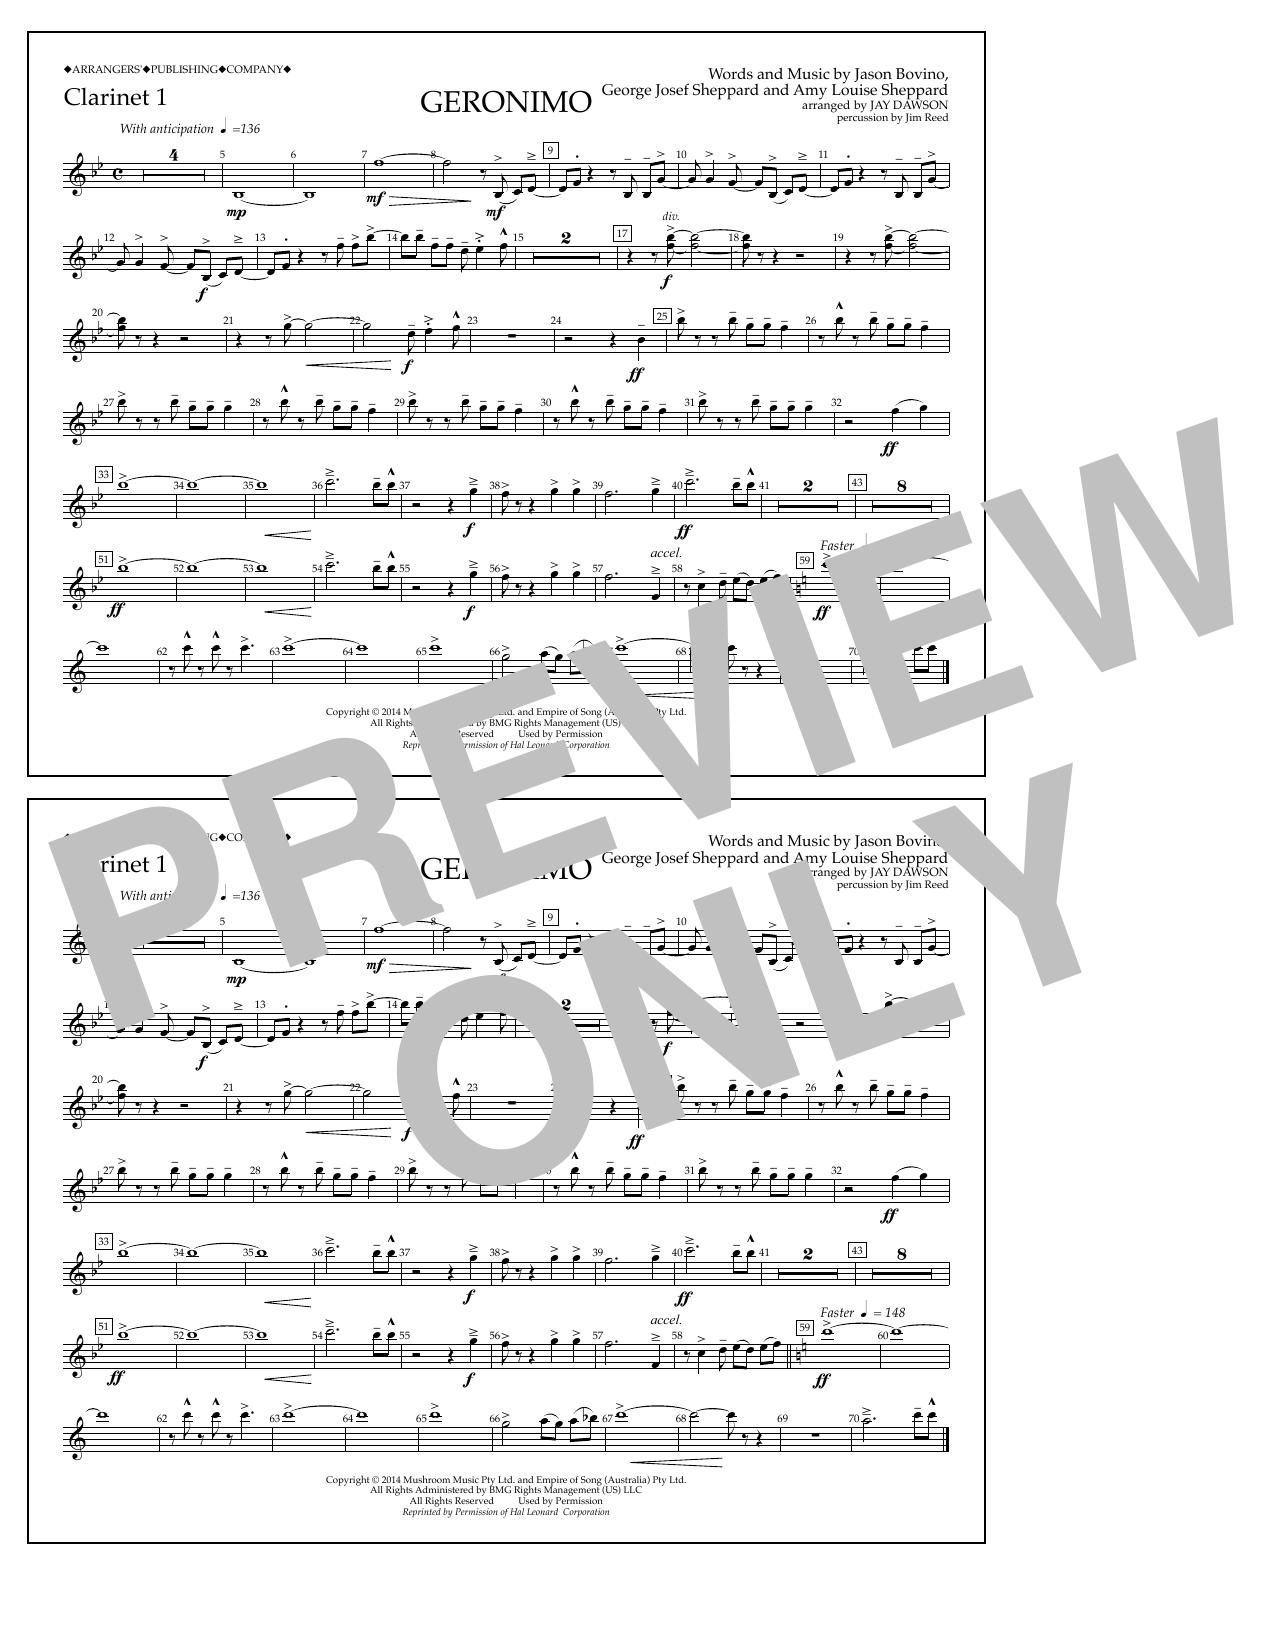 Geronimo - Clarinet 1 Sheet Music